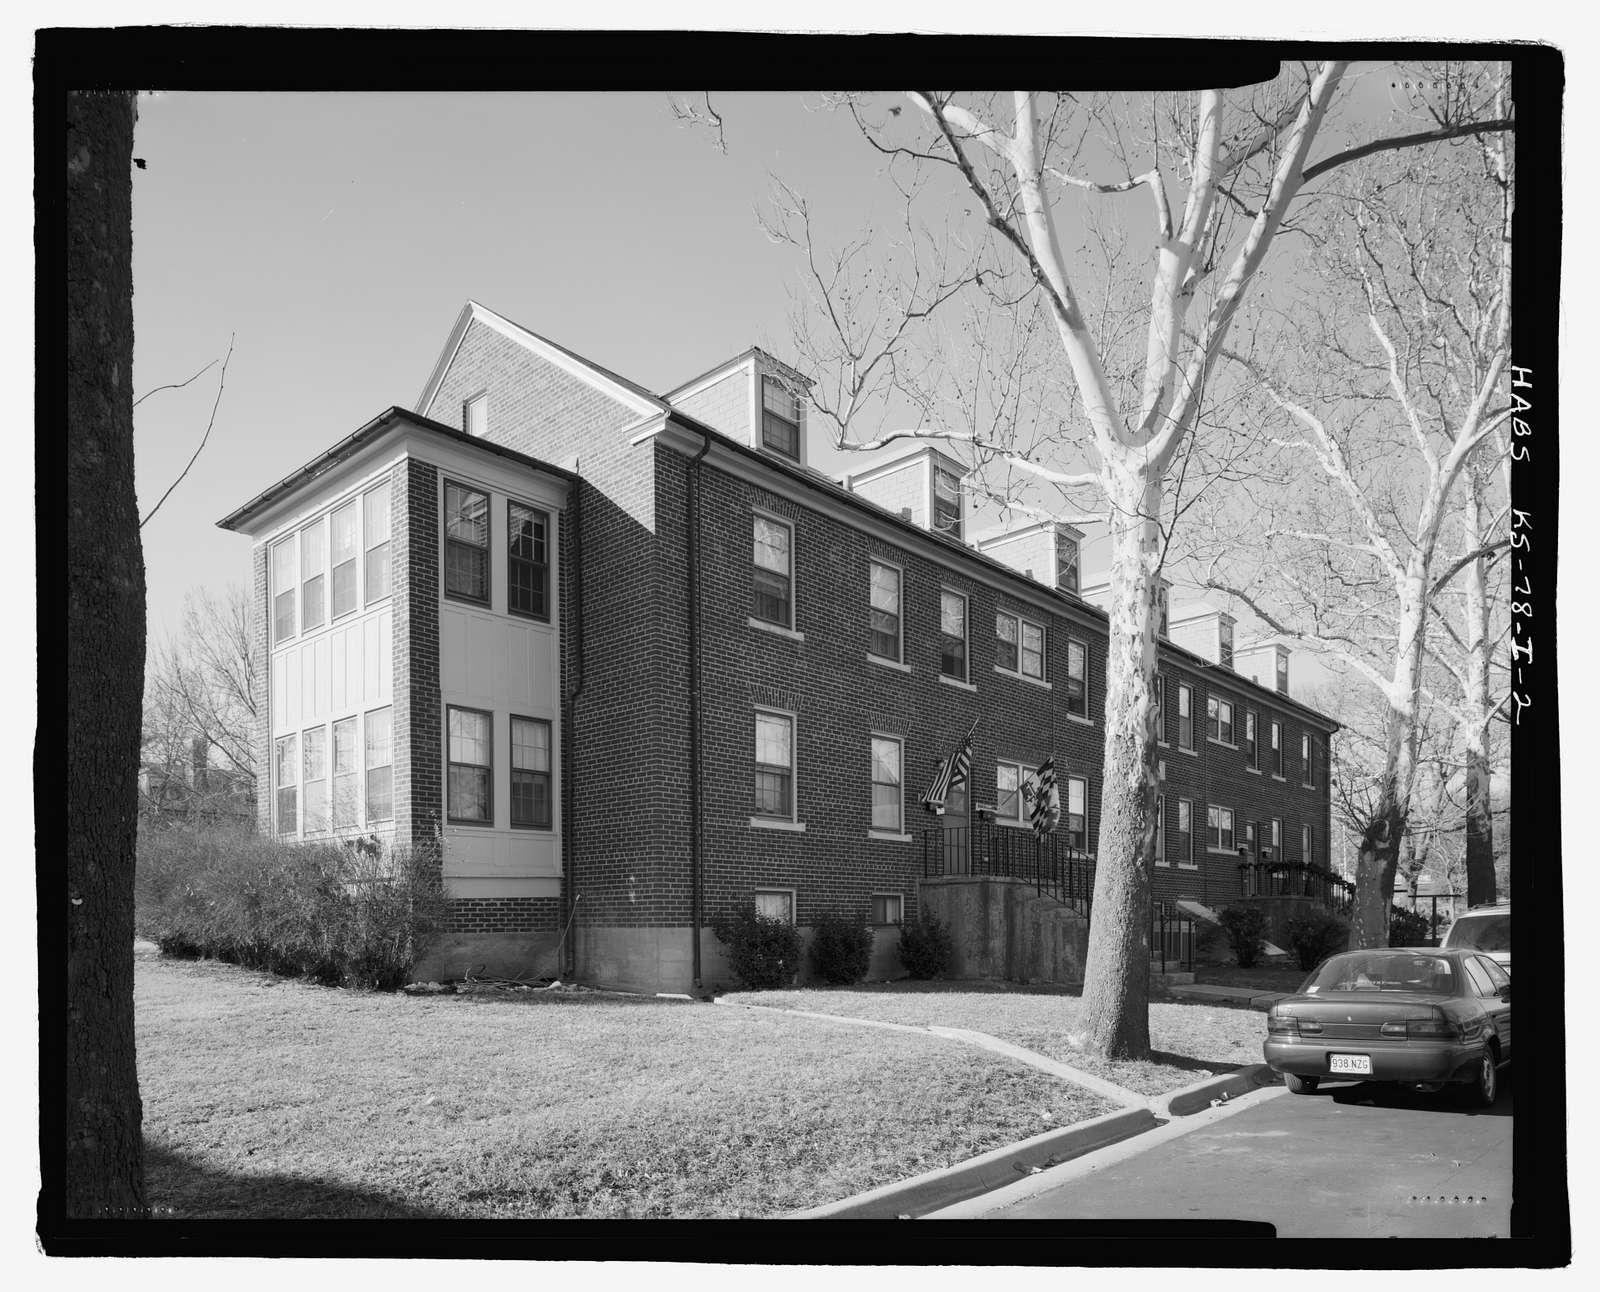 Fort Riley, Carpenter Court Apartments, Building No. 444, 444 Carpenter Place, Riley, Riley County, KS